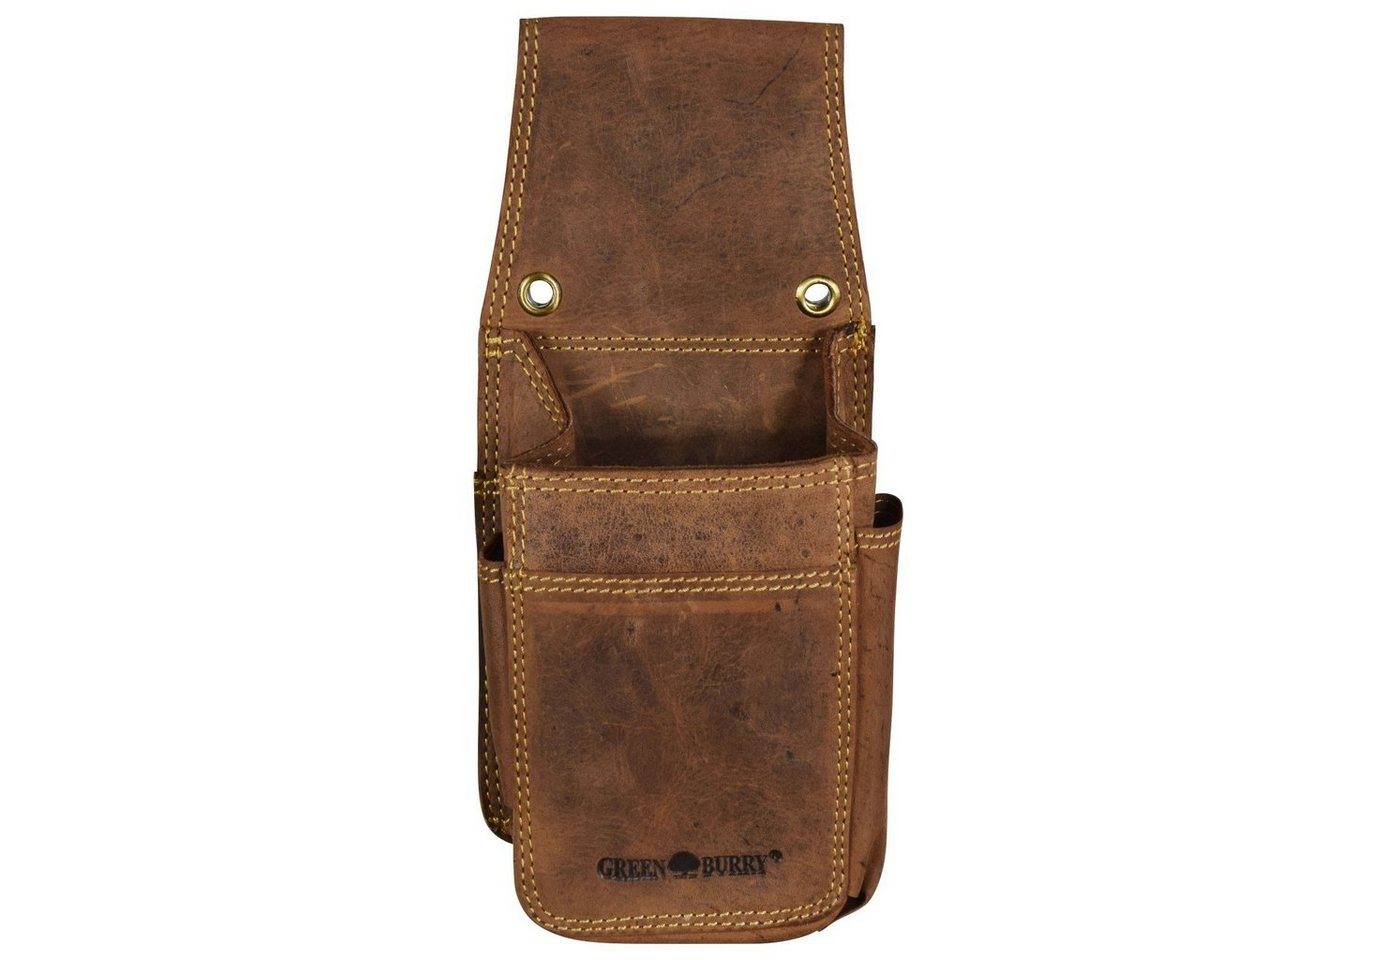 Greenburry Vintage Gürteltasche Leder 14,5 cm | Taschen > Gürteltaschen | Braun | Leder | Greenburry